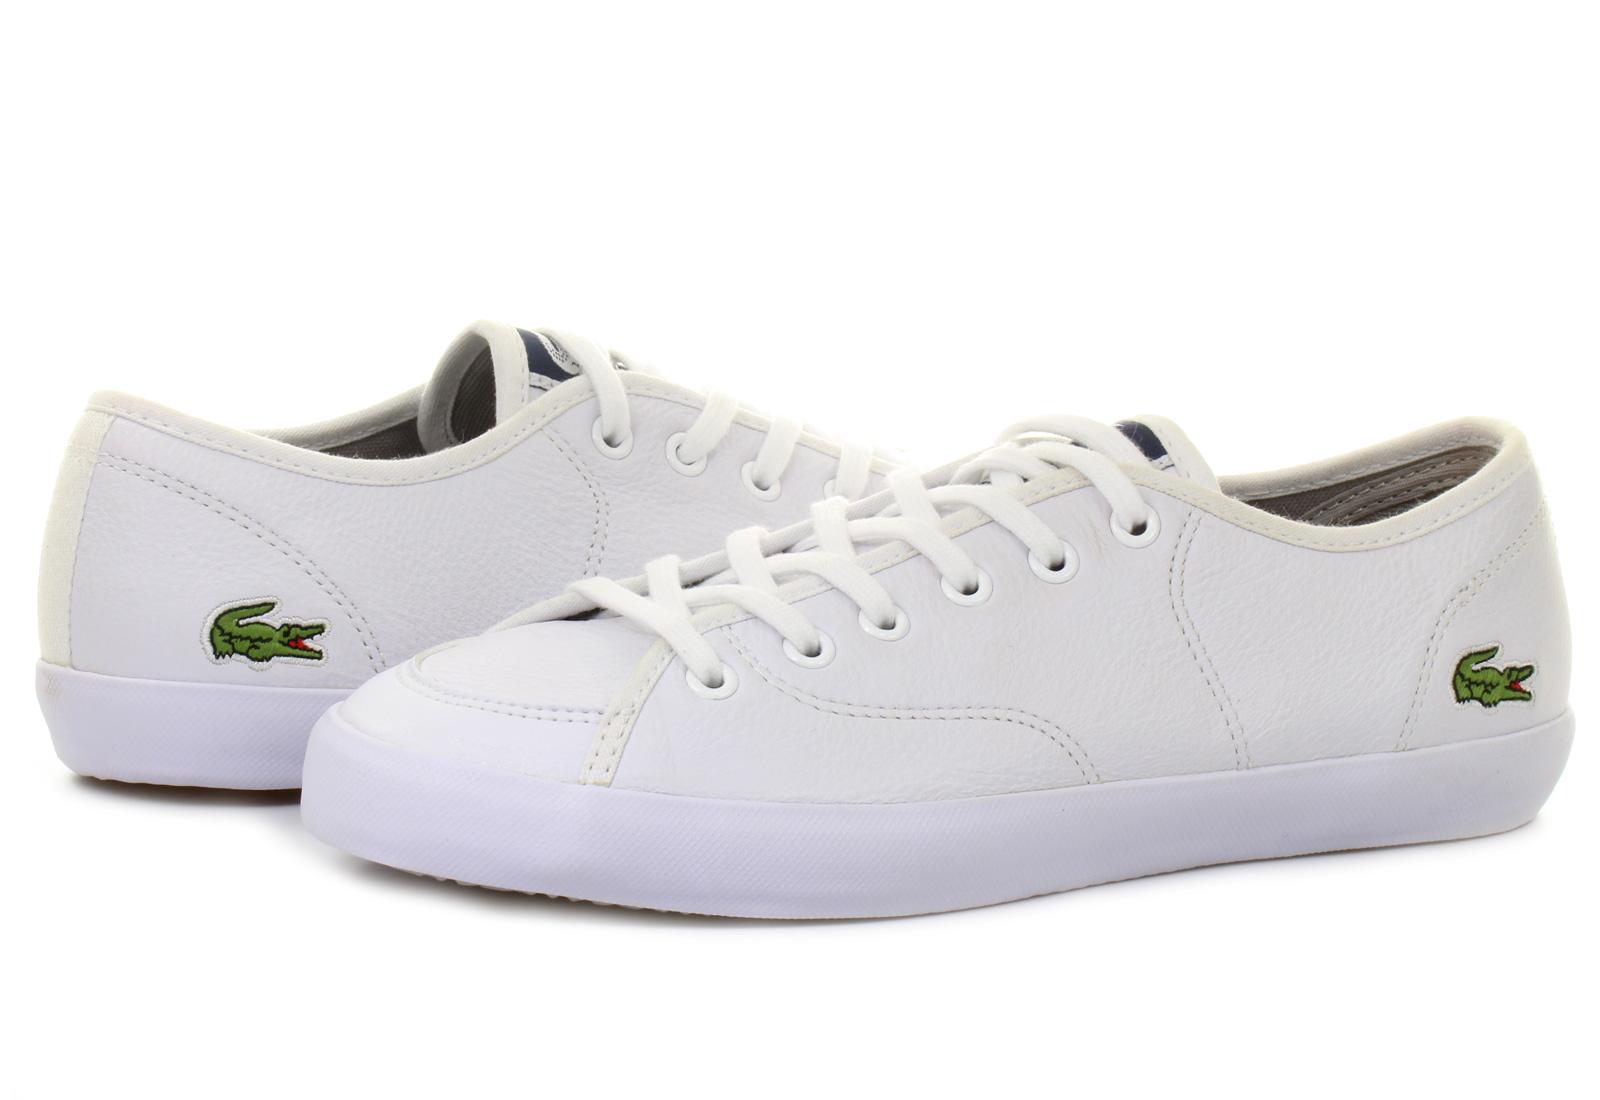 Lacoste Shoes - Nievo - 141spw0103-21g - Office Shoes Magyarország 4c4d4dd1a1